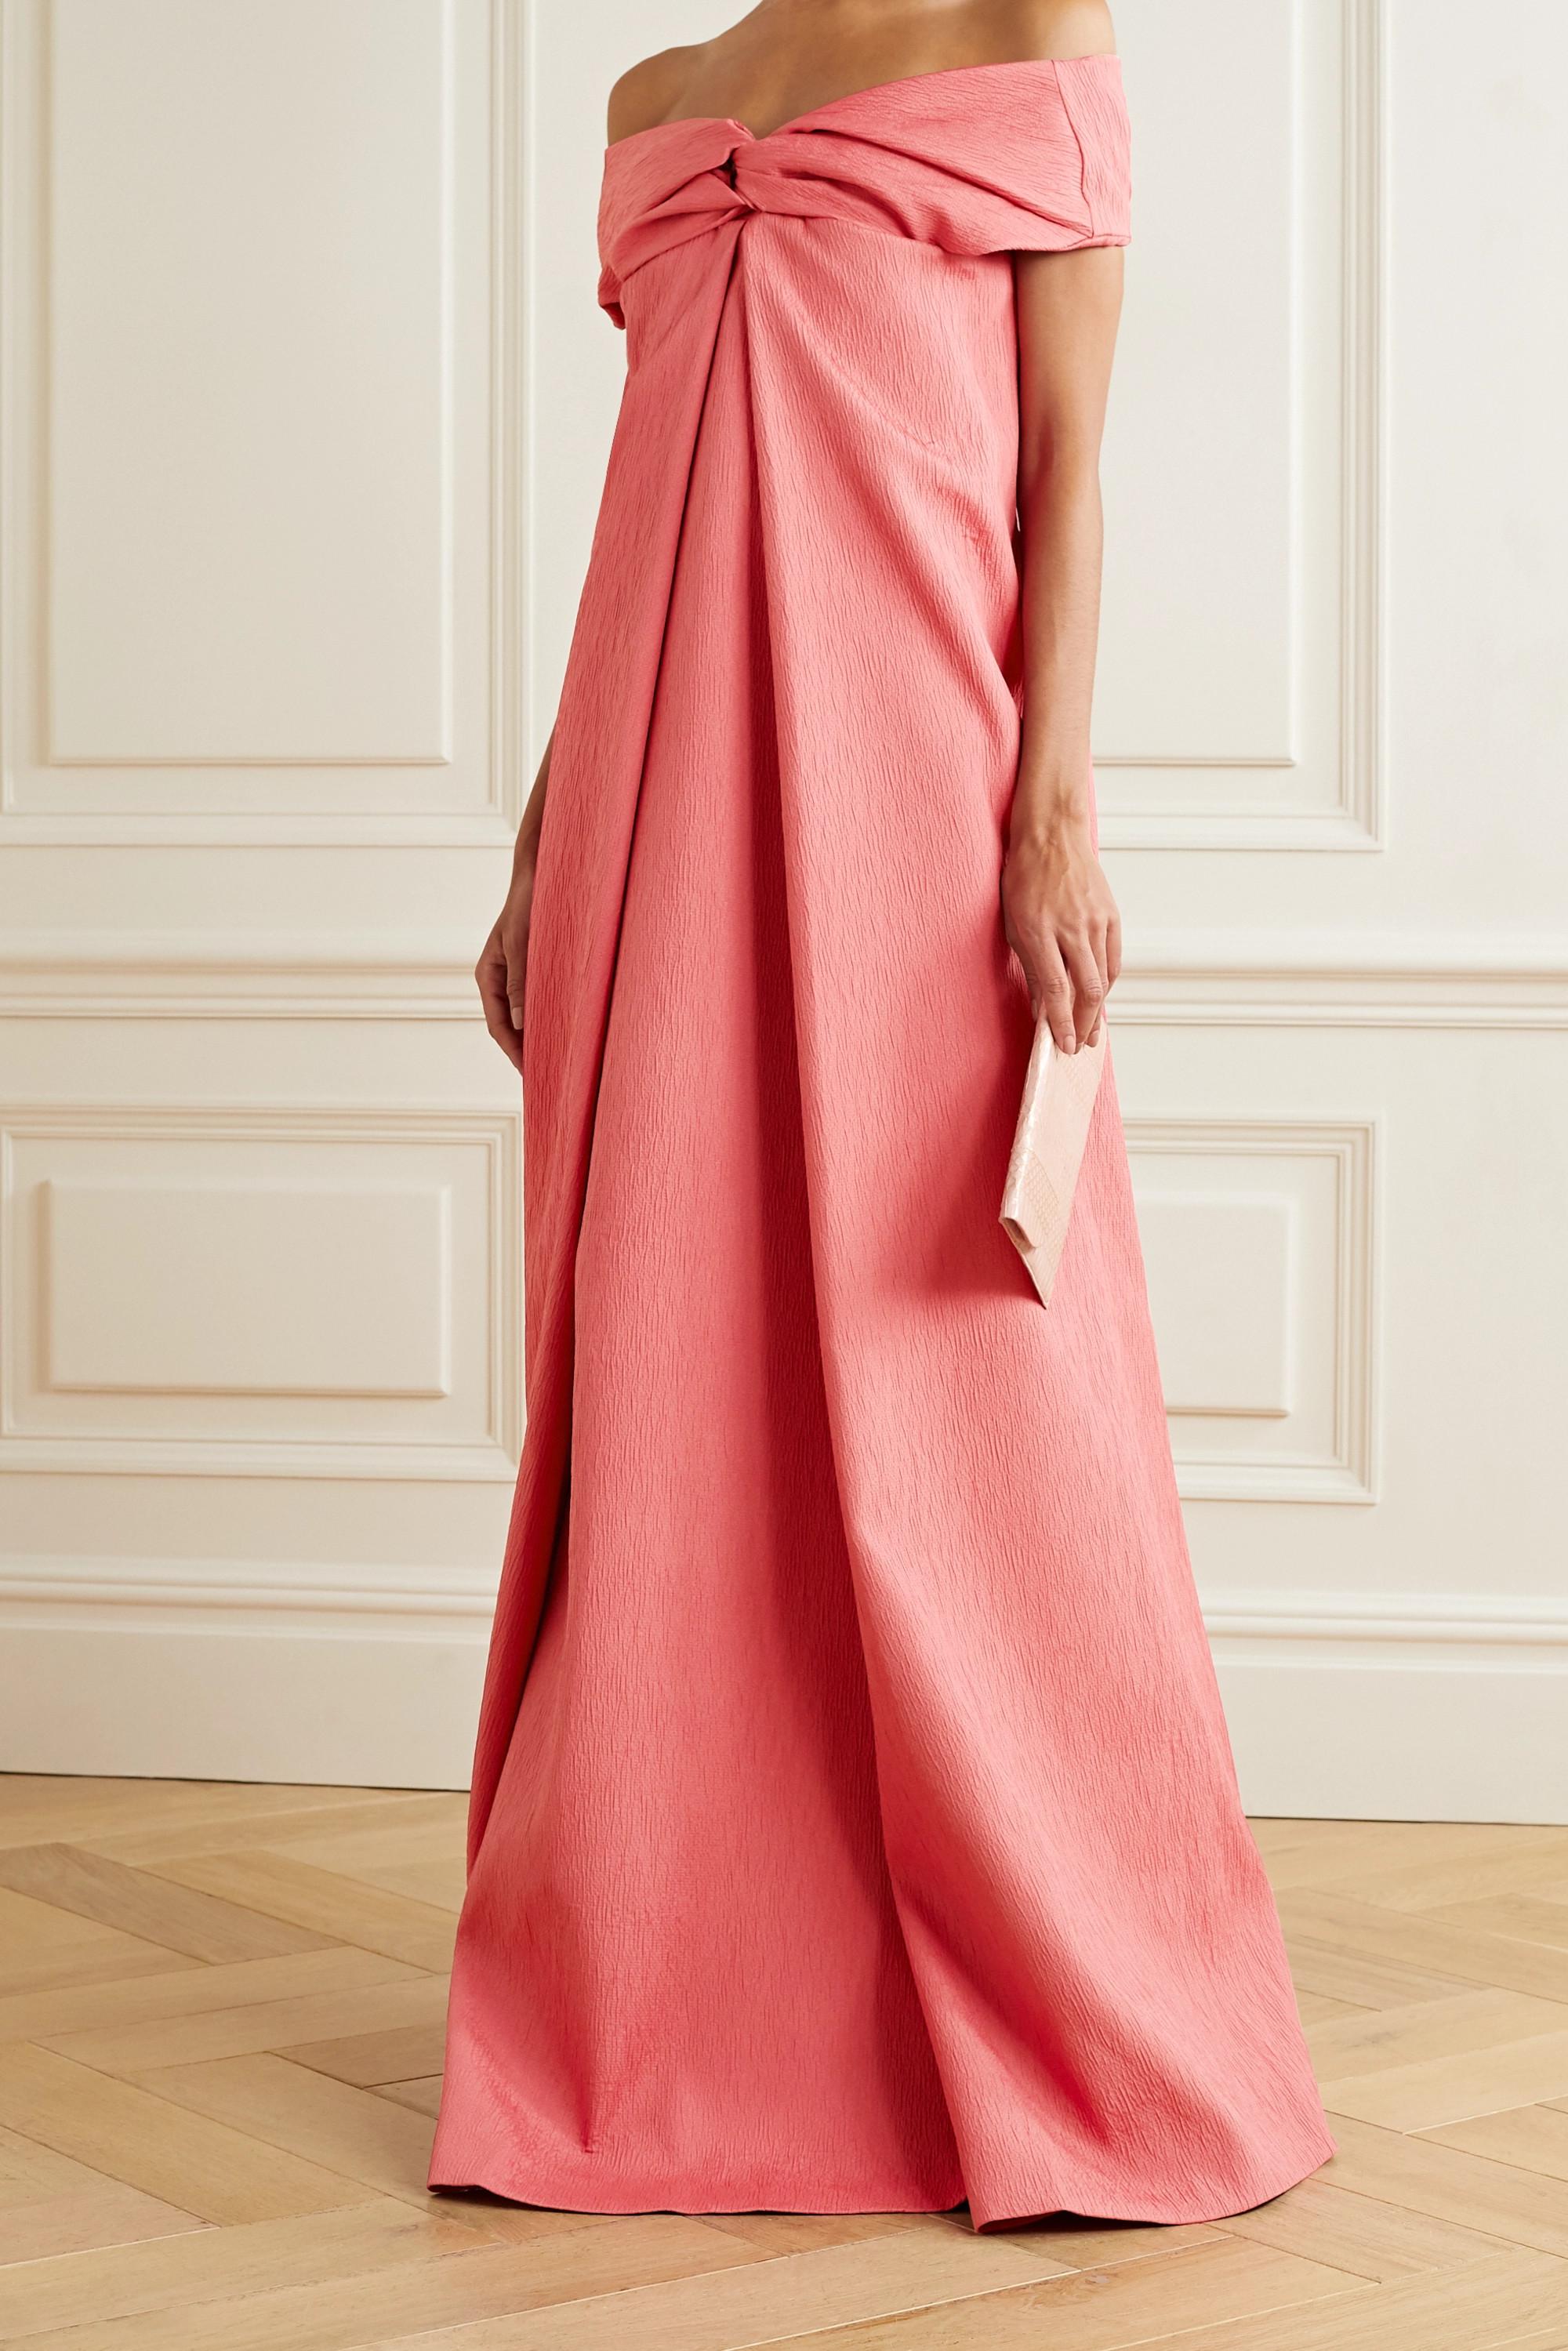 Emilia Wickstead Ursa off-the-shoulder cloqué gown